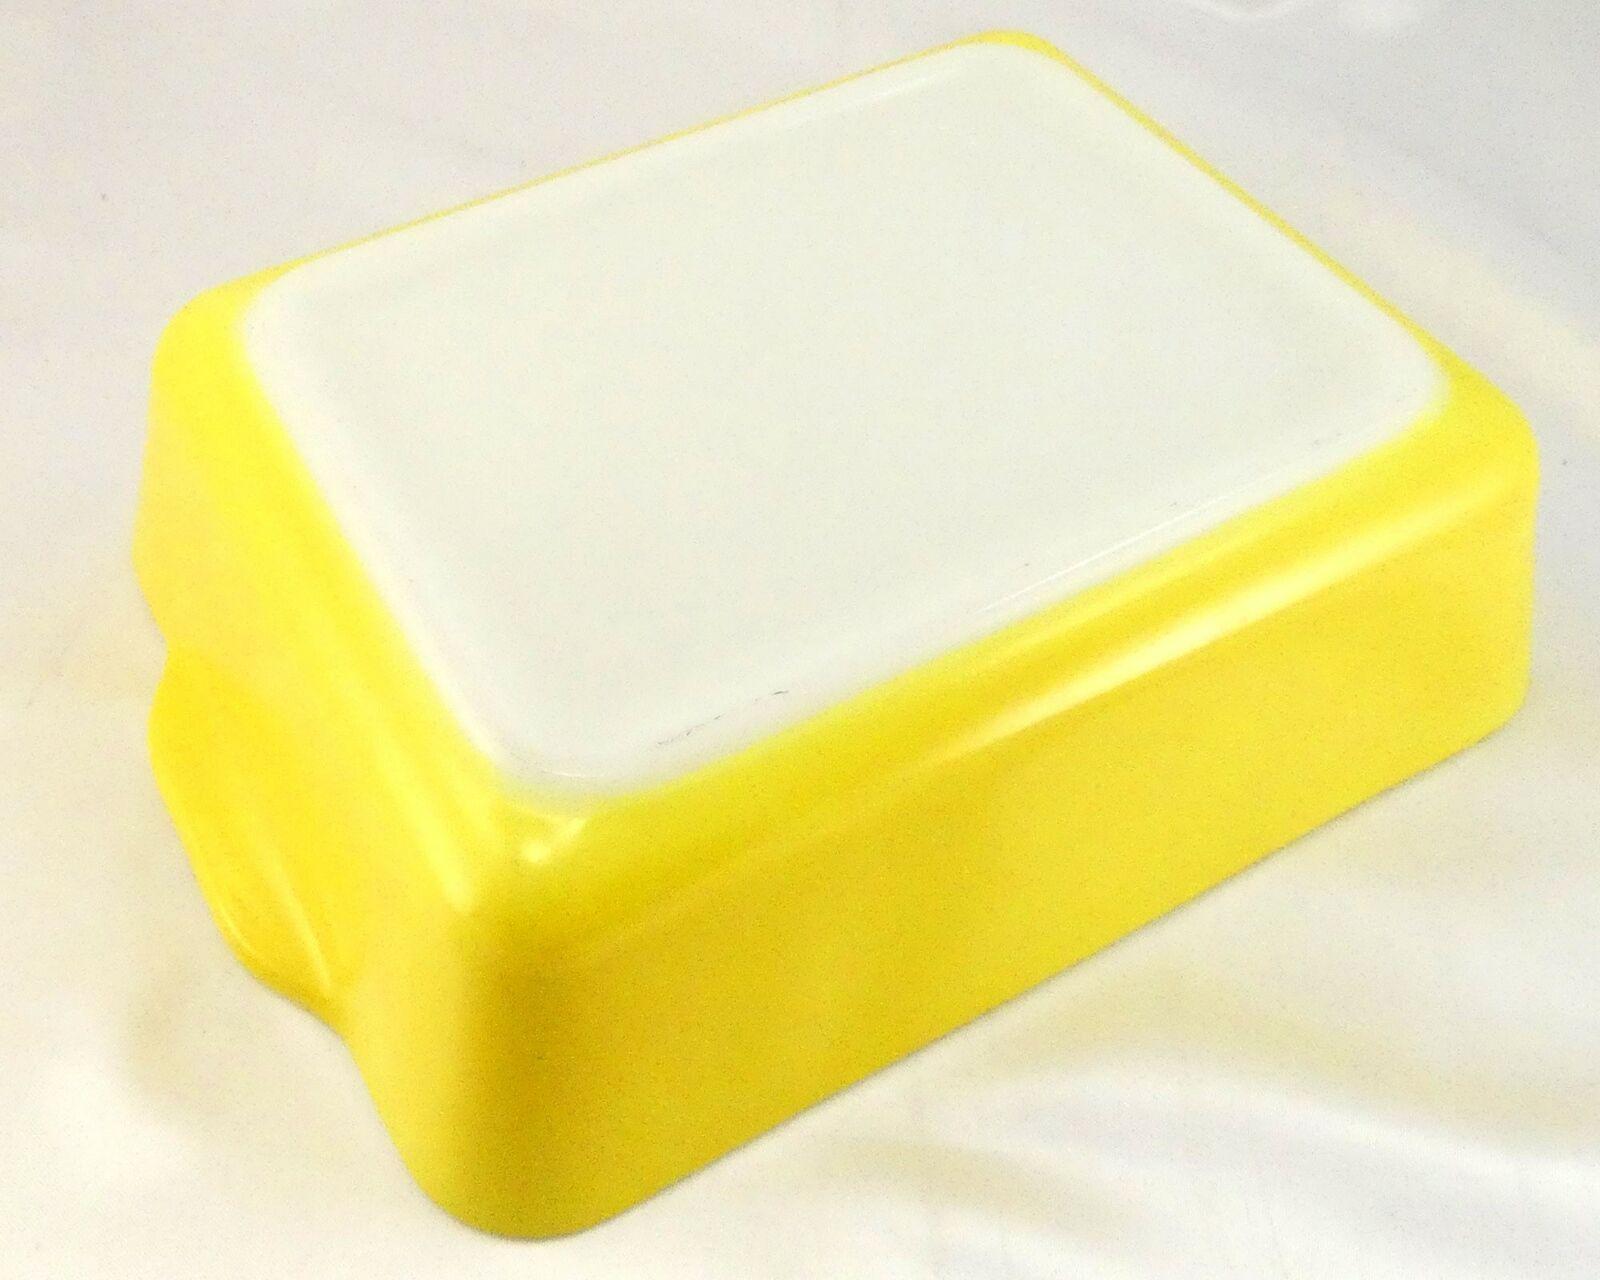 Pyrex 503 Banana Yellow Fridge Dish Milk Glass w/ Lid Made in the USA image 7